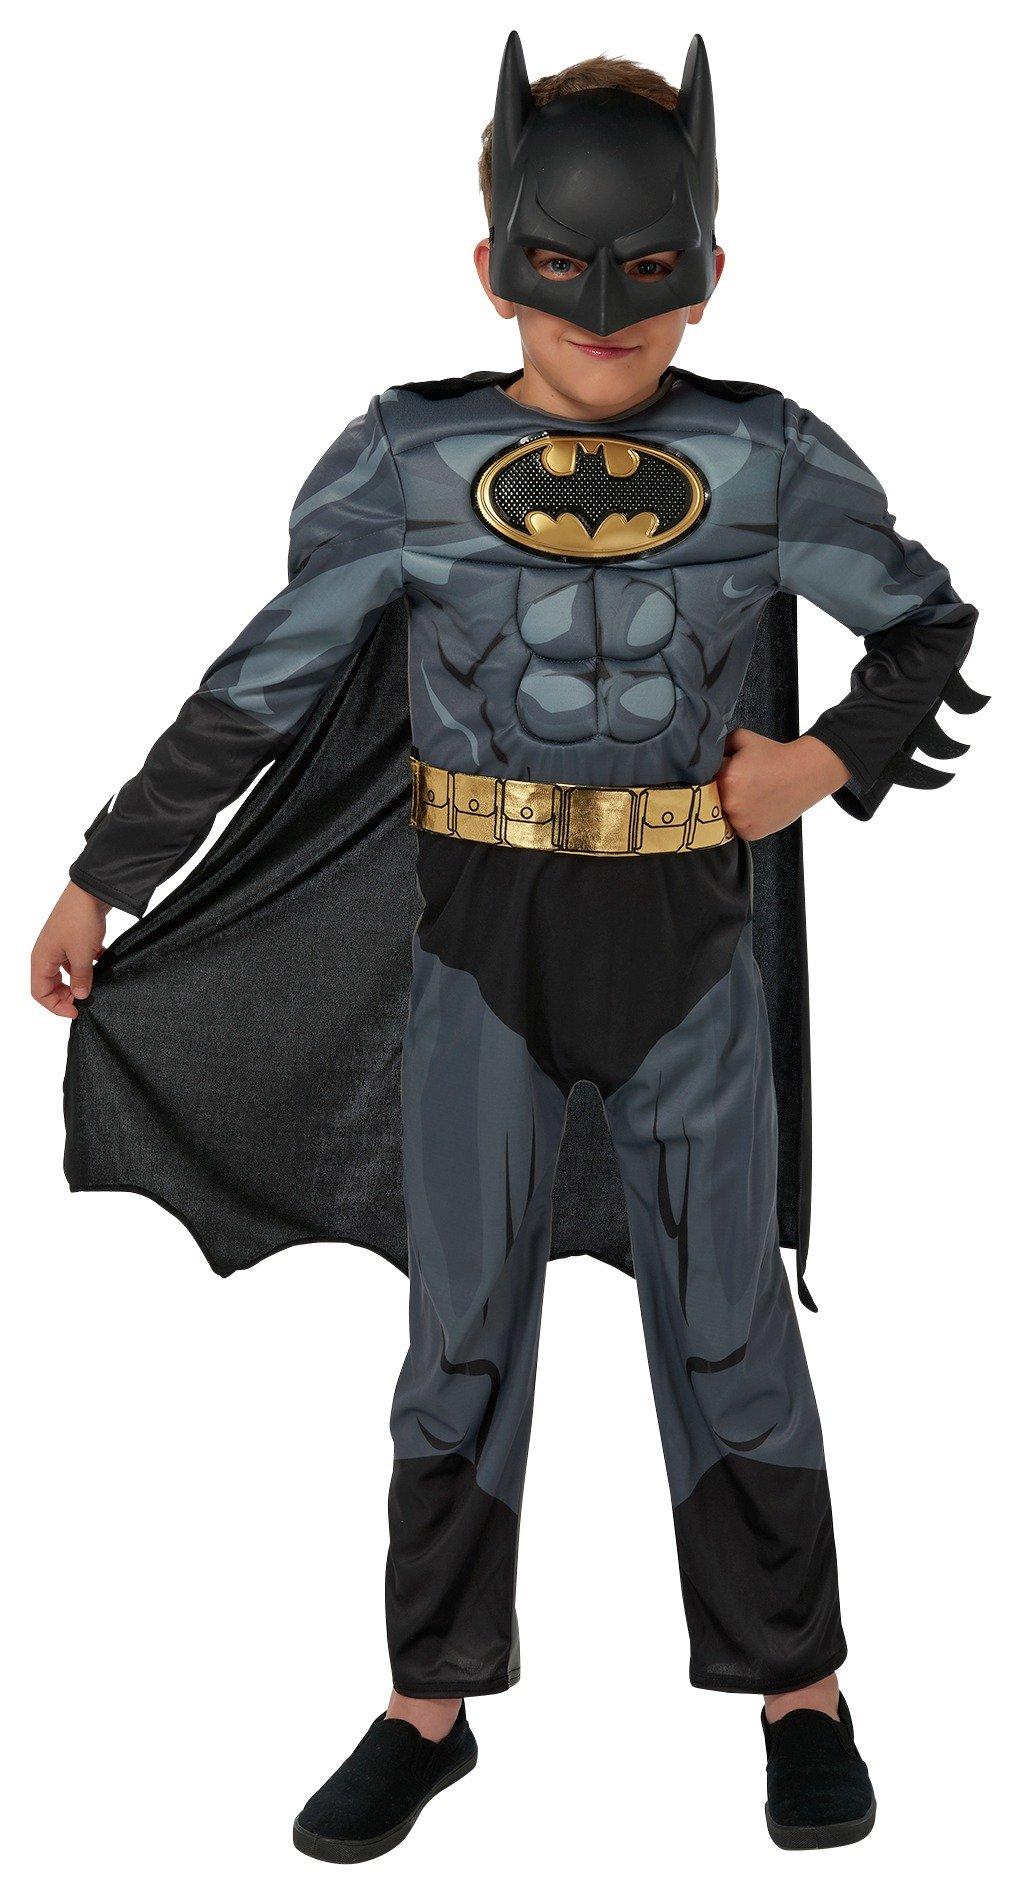 Image of DC Batman Fancy Dress Costume - 3-4 Years